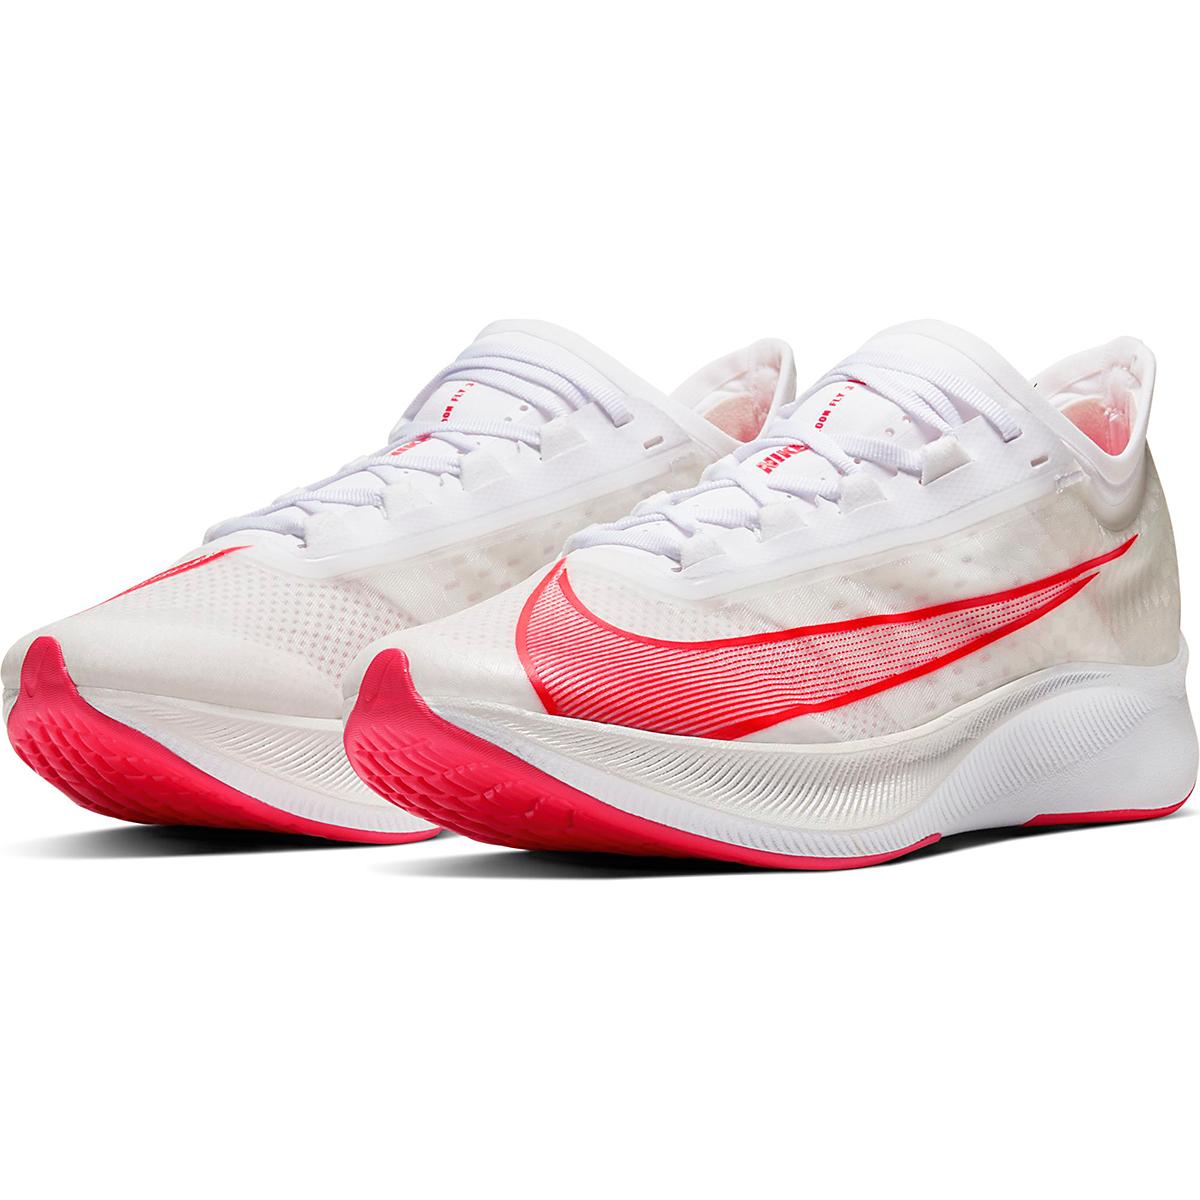 Men's Nike Zoom Fly 3 Running Shoe - Color: White/Laser Crimson - Size: 6 - Width: Regular, White/Laser Crimson, large, image 4